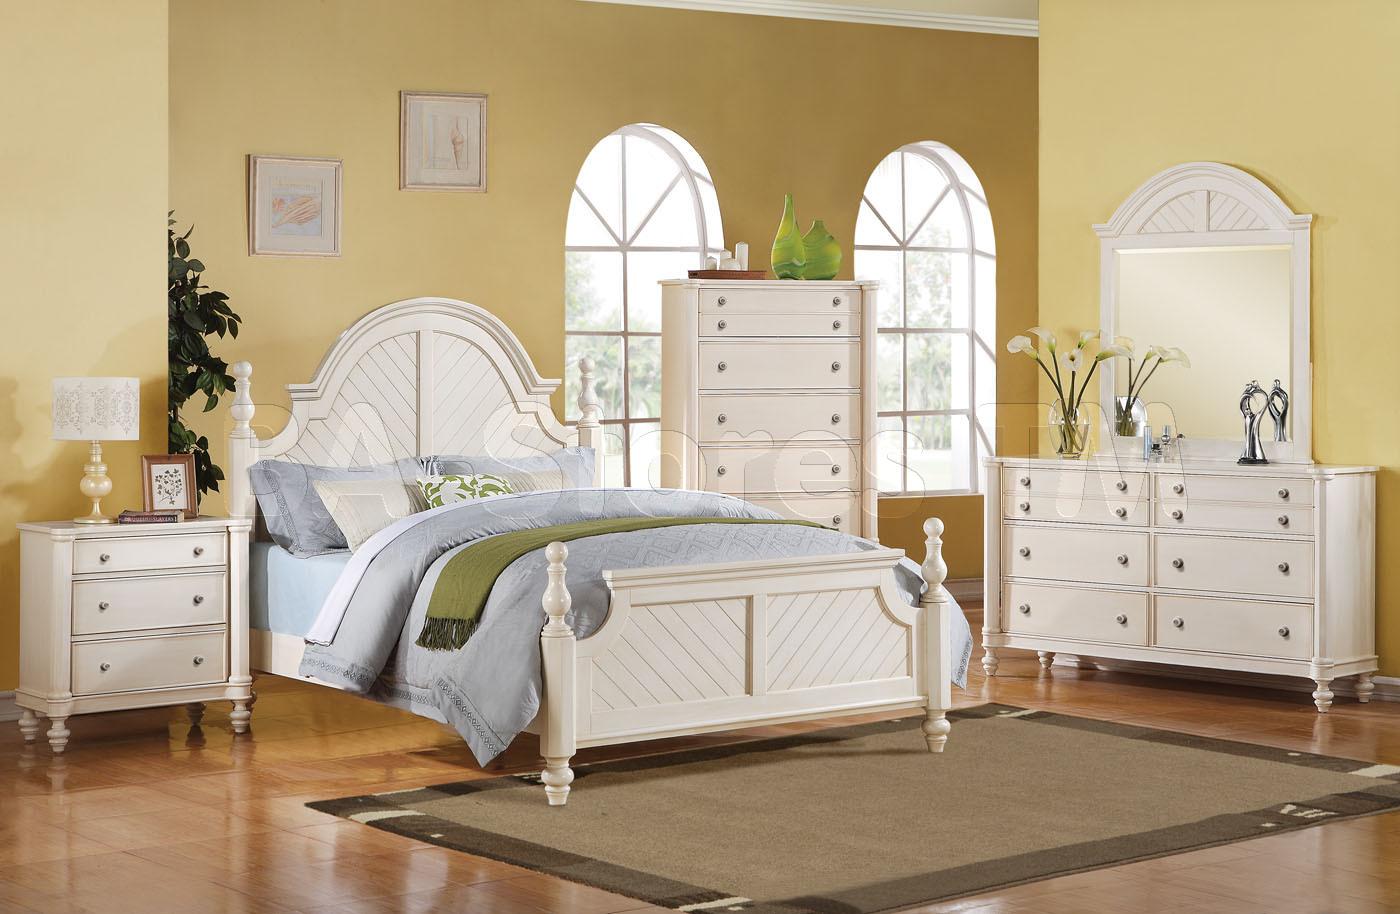 white bedroom furniture decorating ideas photo - 8